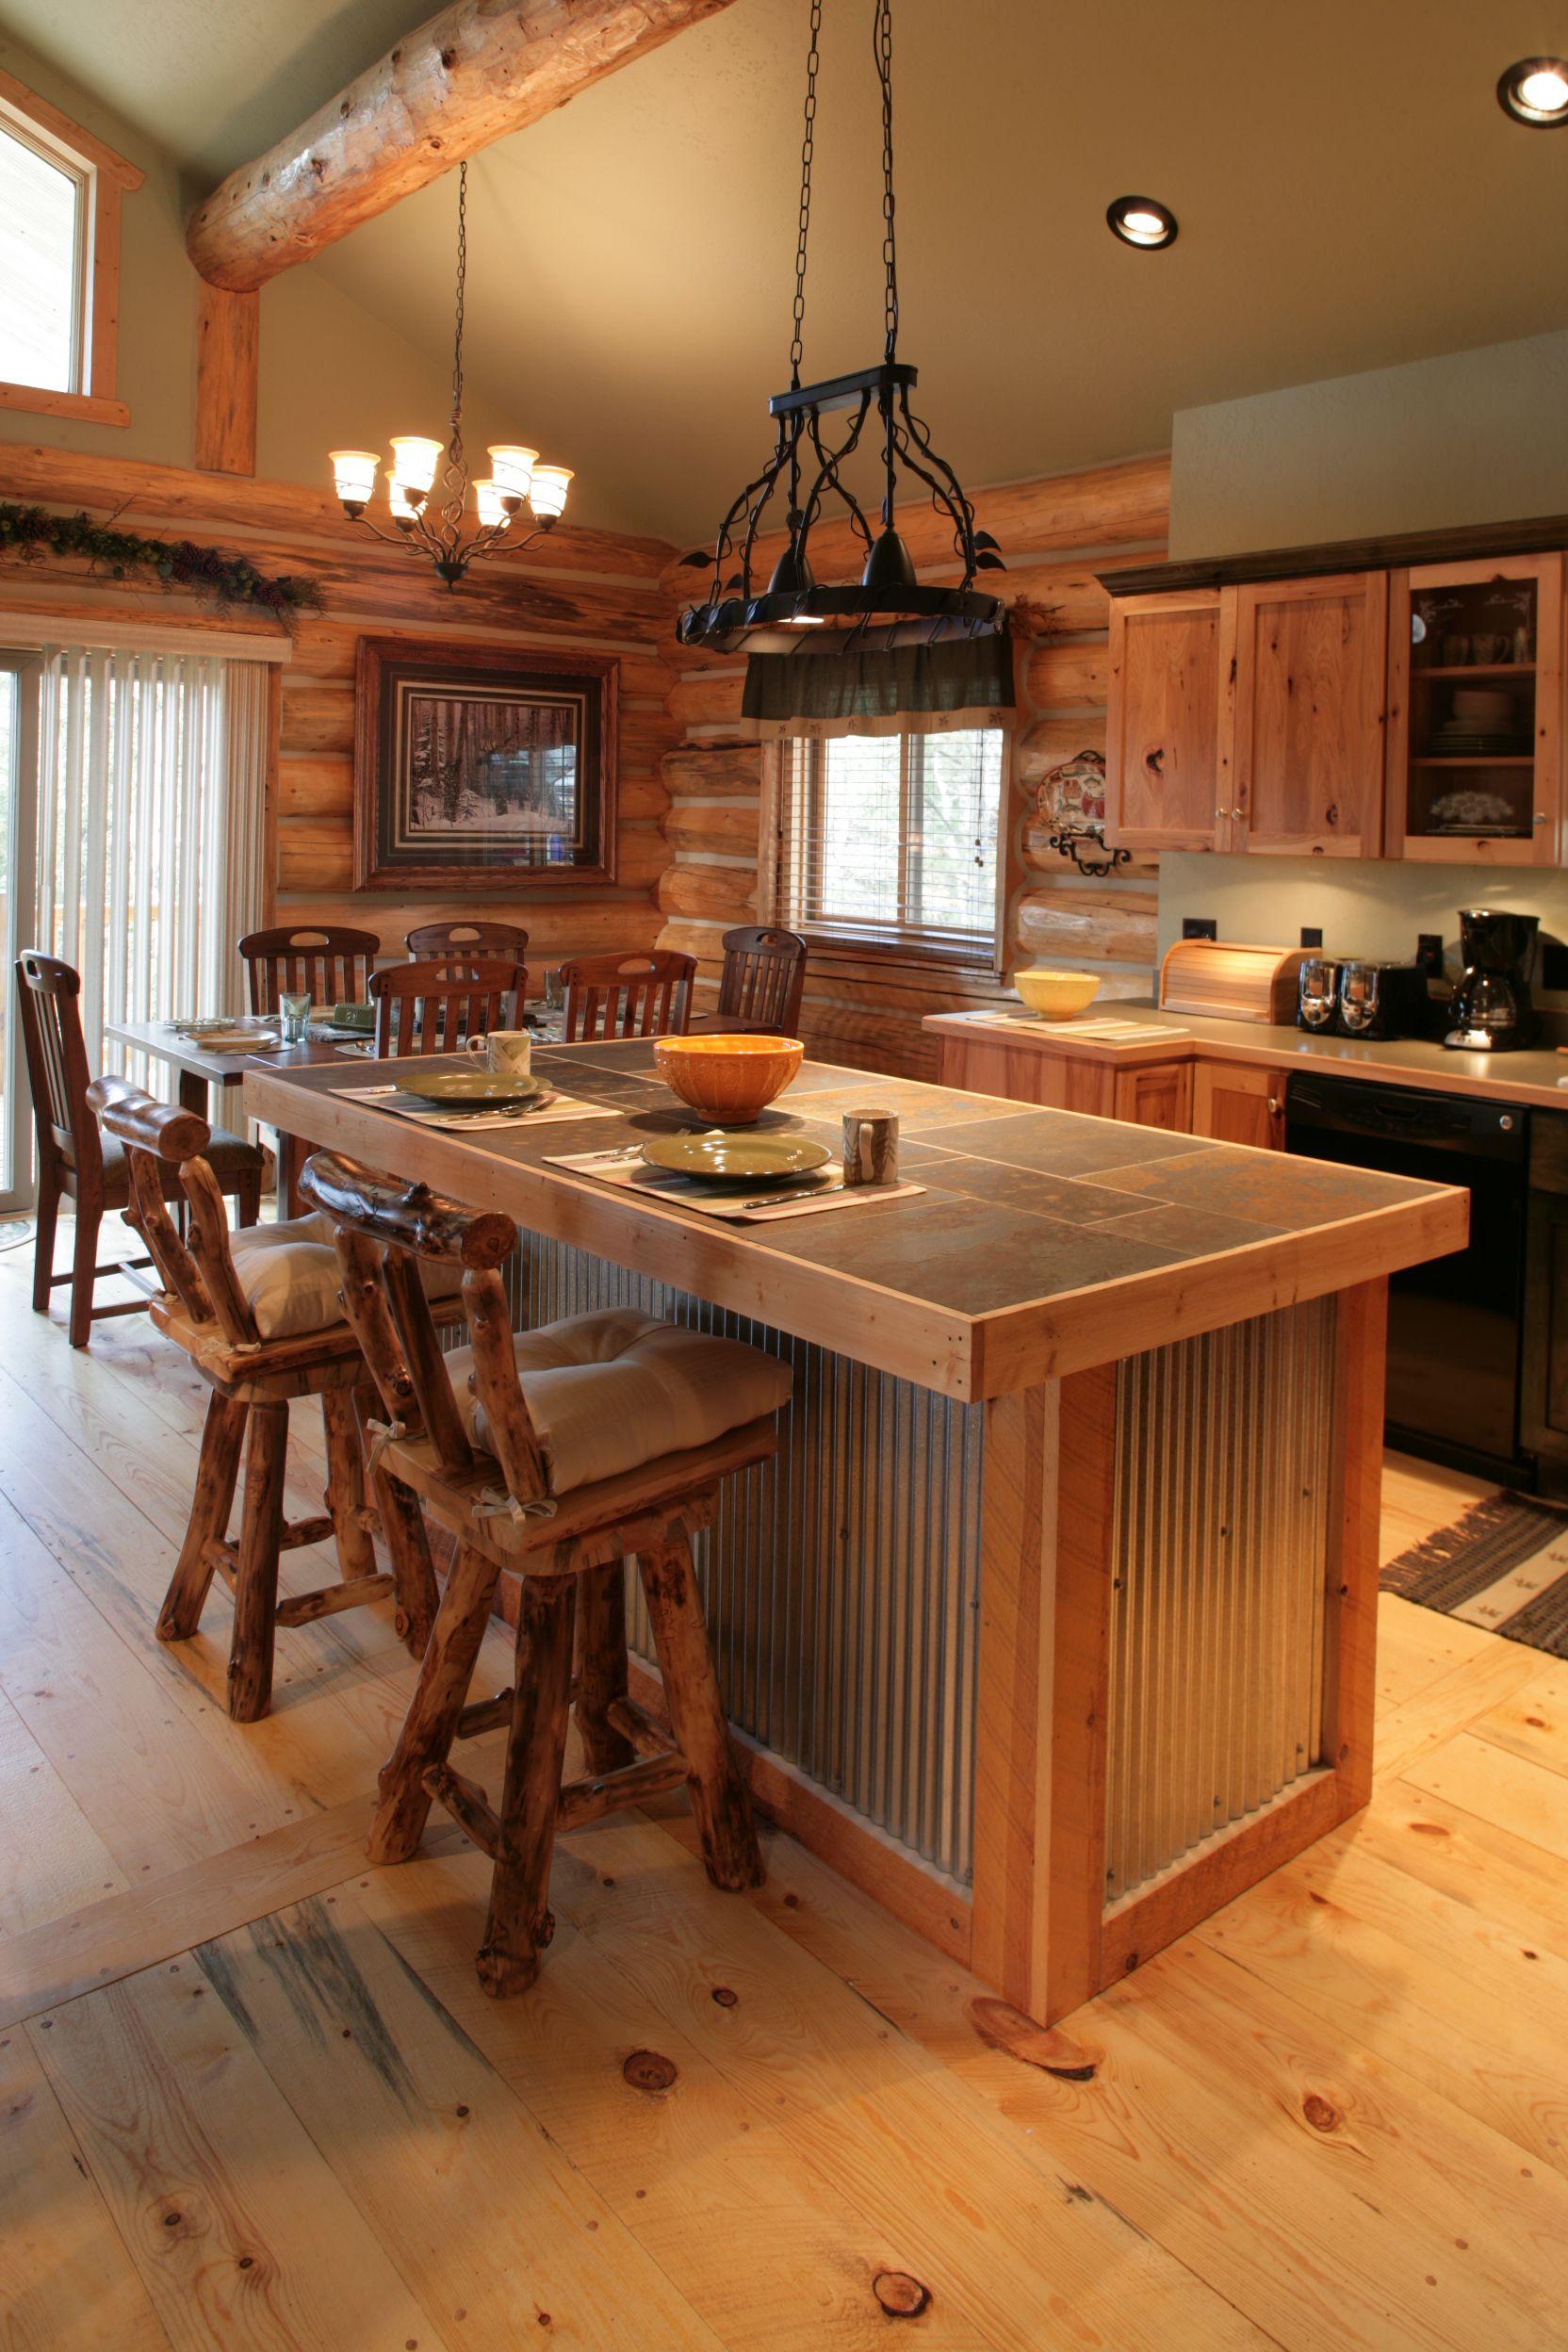 Mountain Wood Works Inc Acorn Interiors Pages Black Hills Log Home Builders Rustic Kitchen Islandrustic